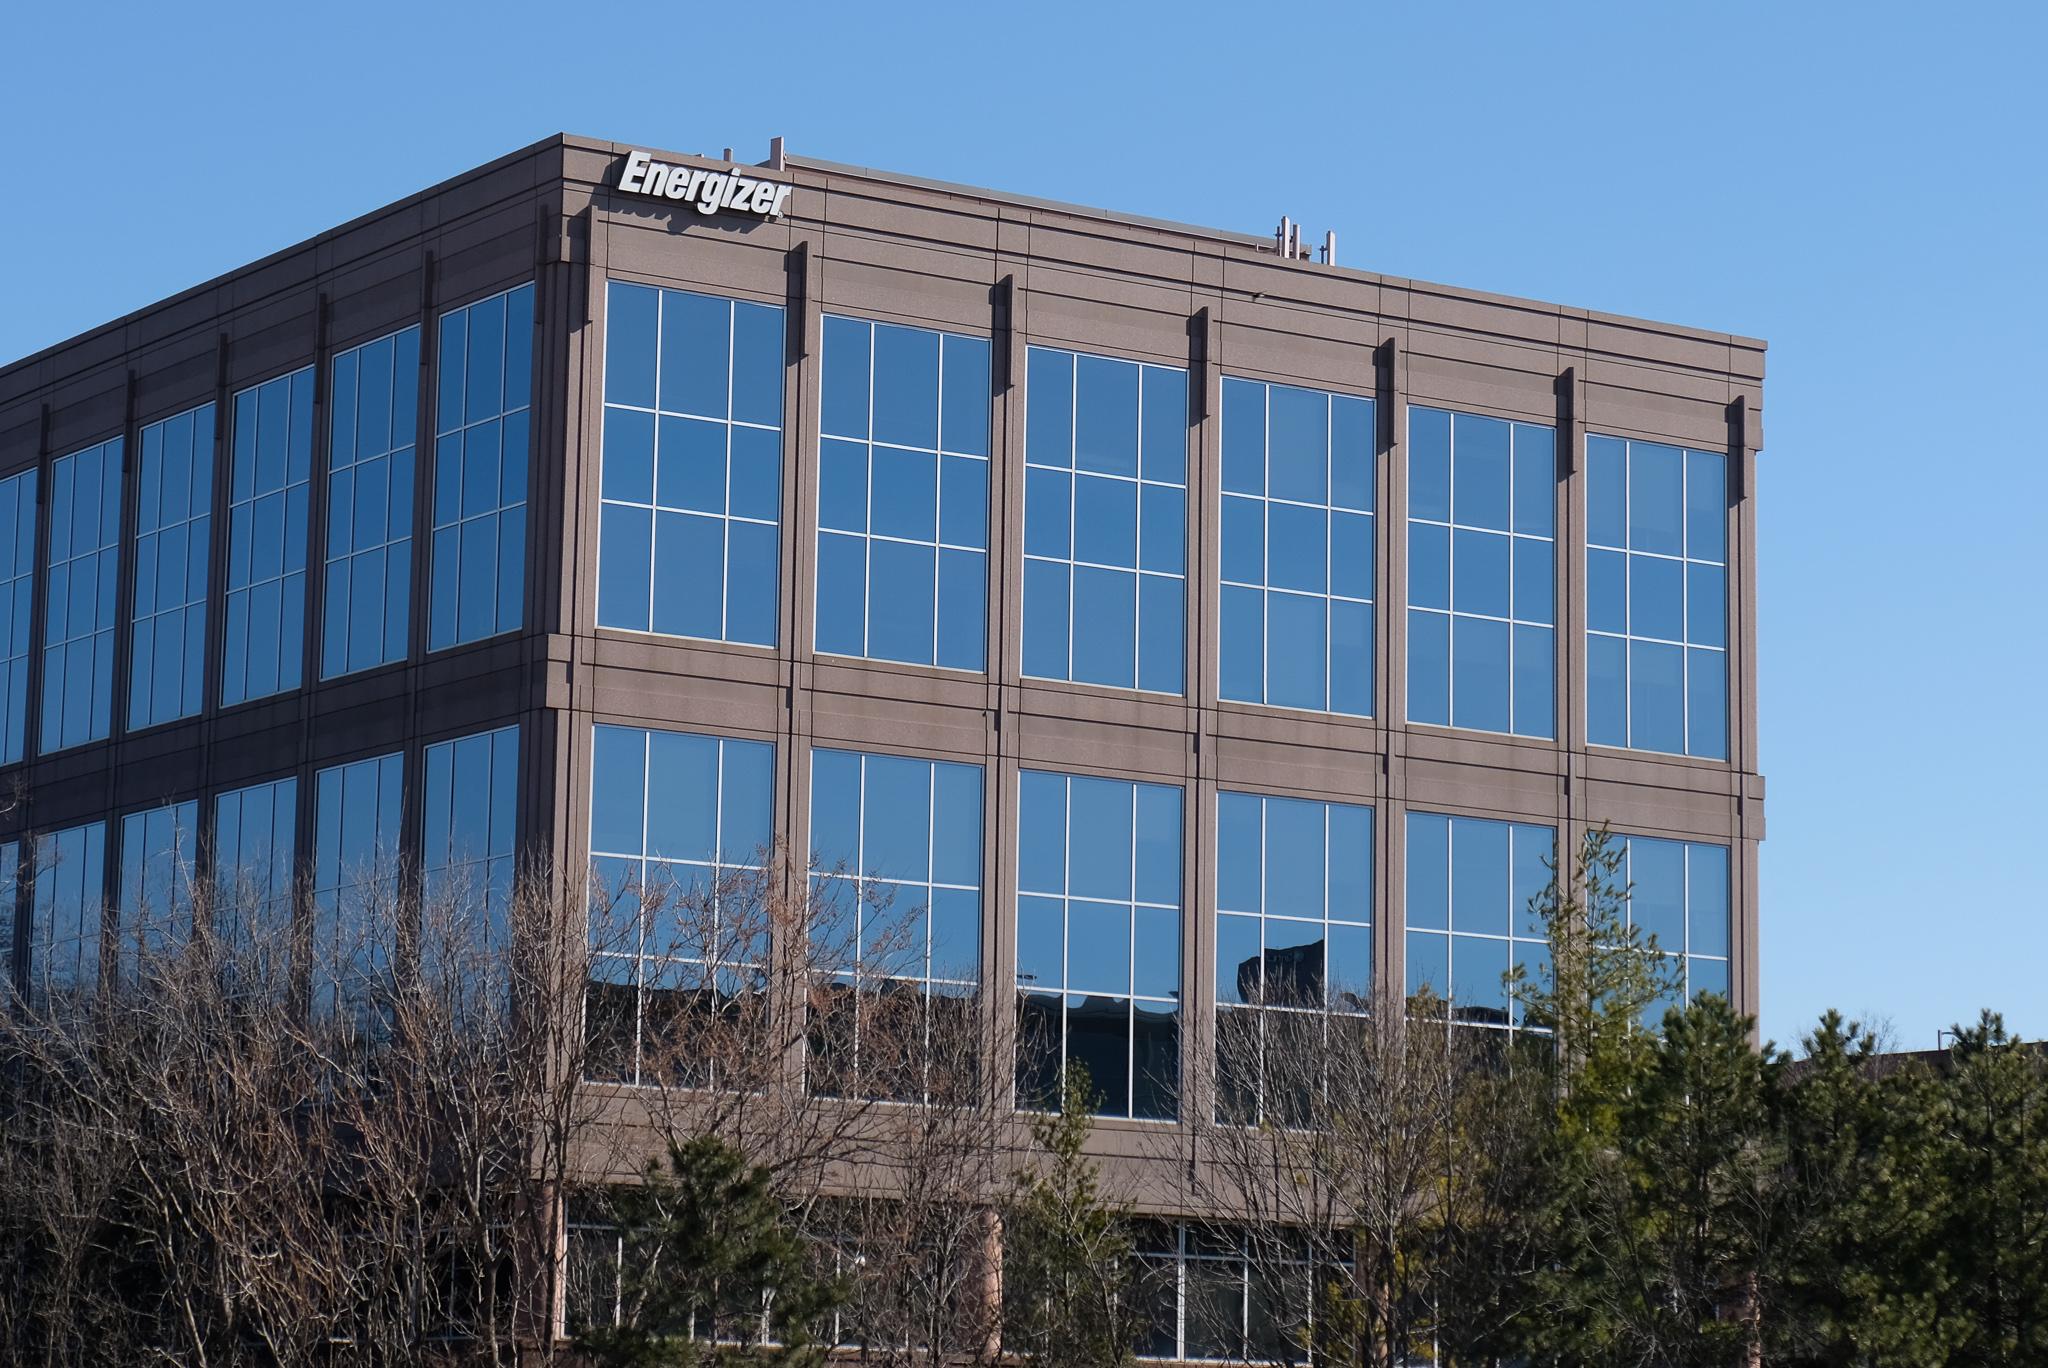 Energizer's corporate headquarters in St. Louis, Missouri.